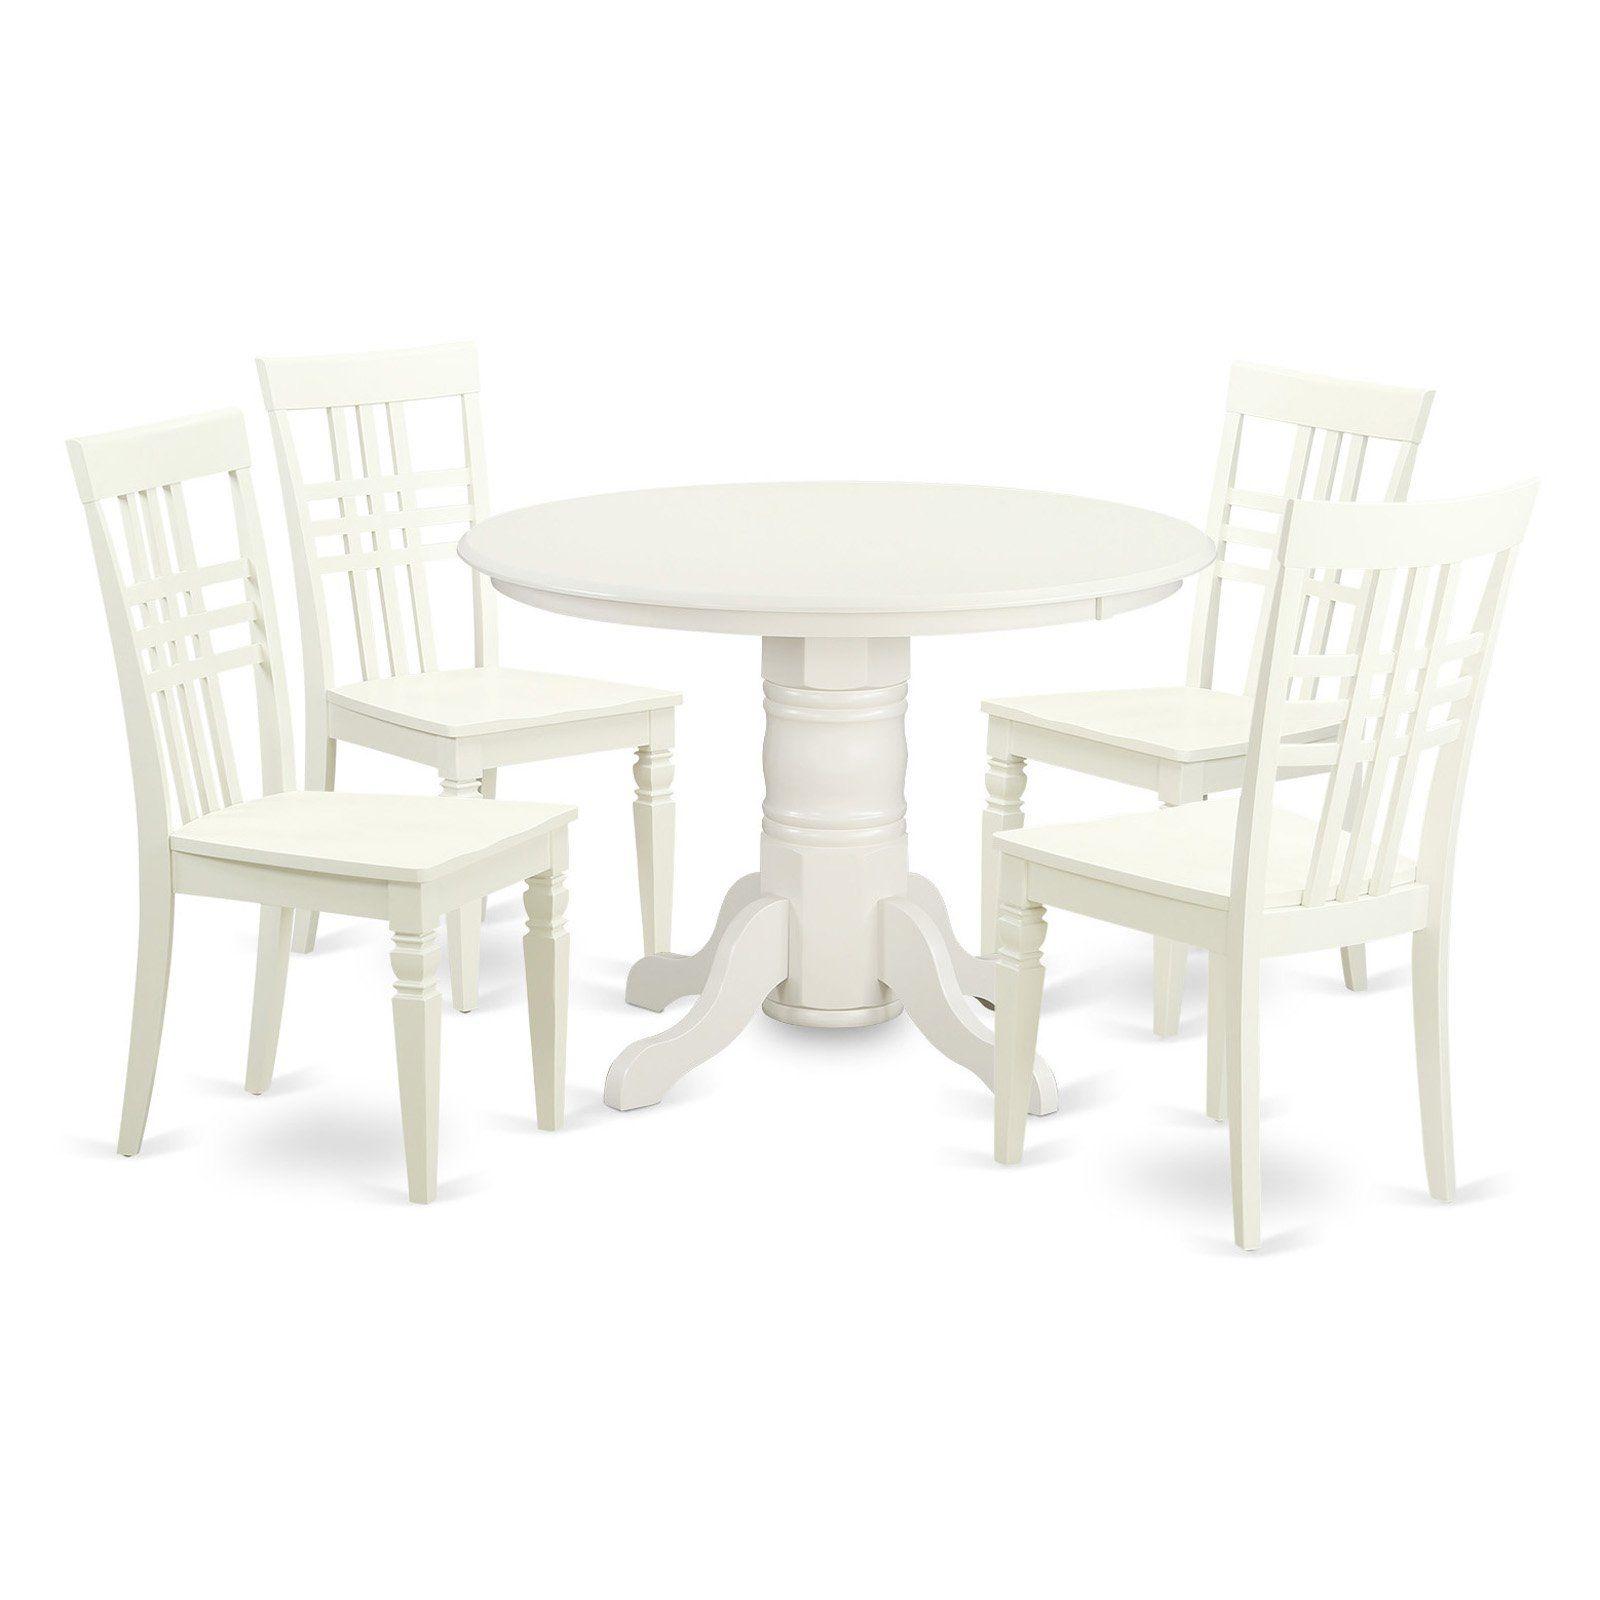 East West Furniture Shelton 5 Piece Latticeback Dining Table Set